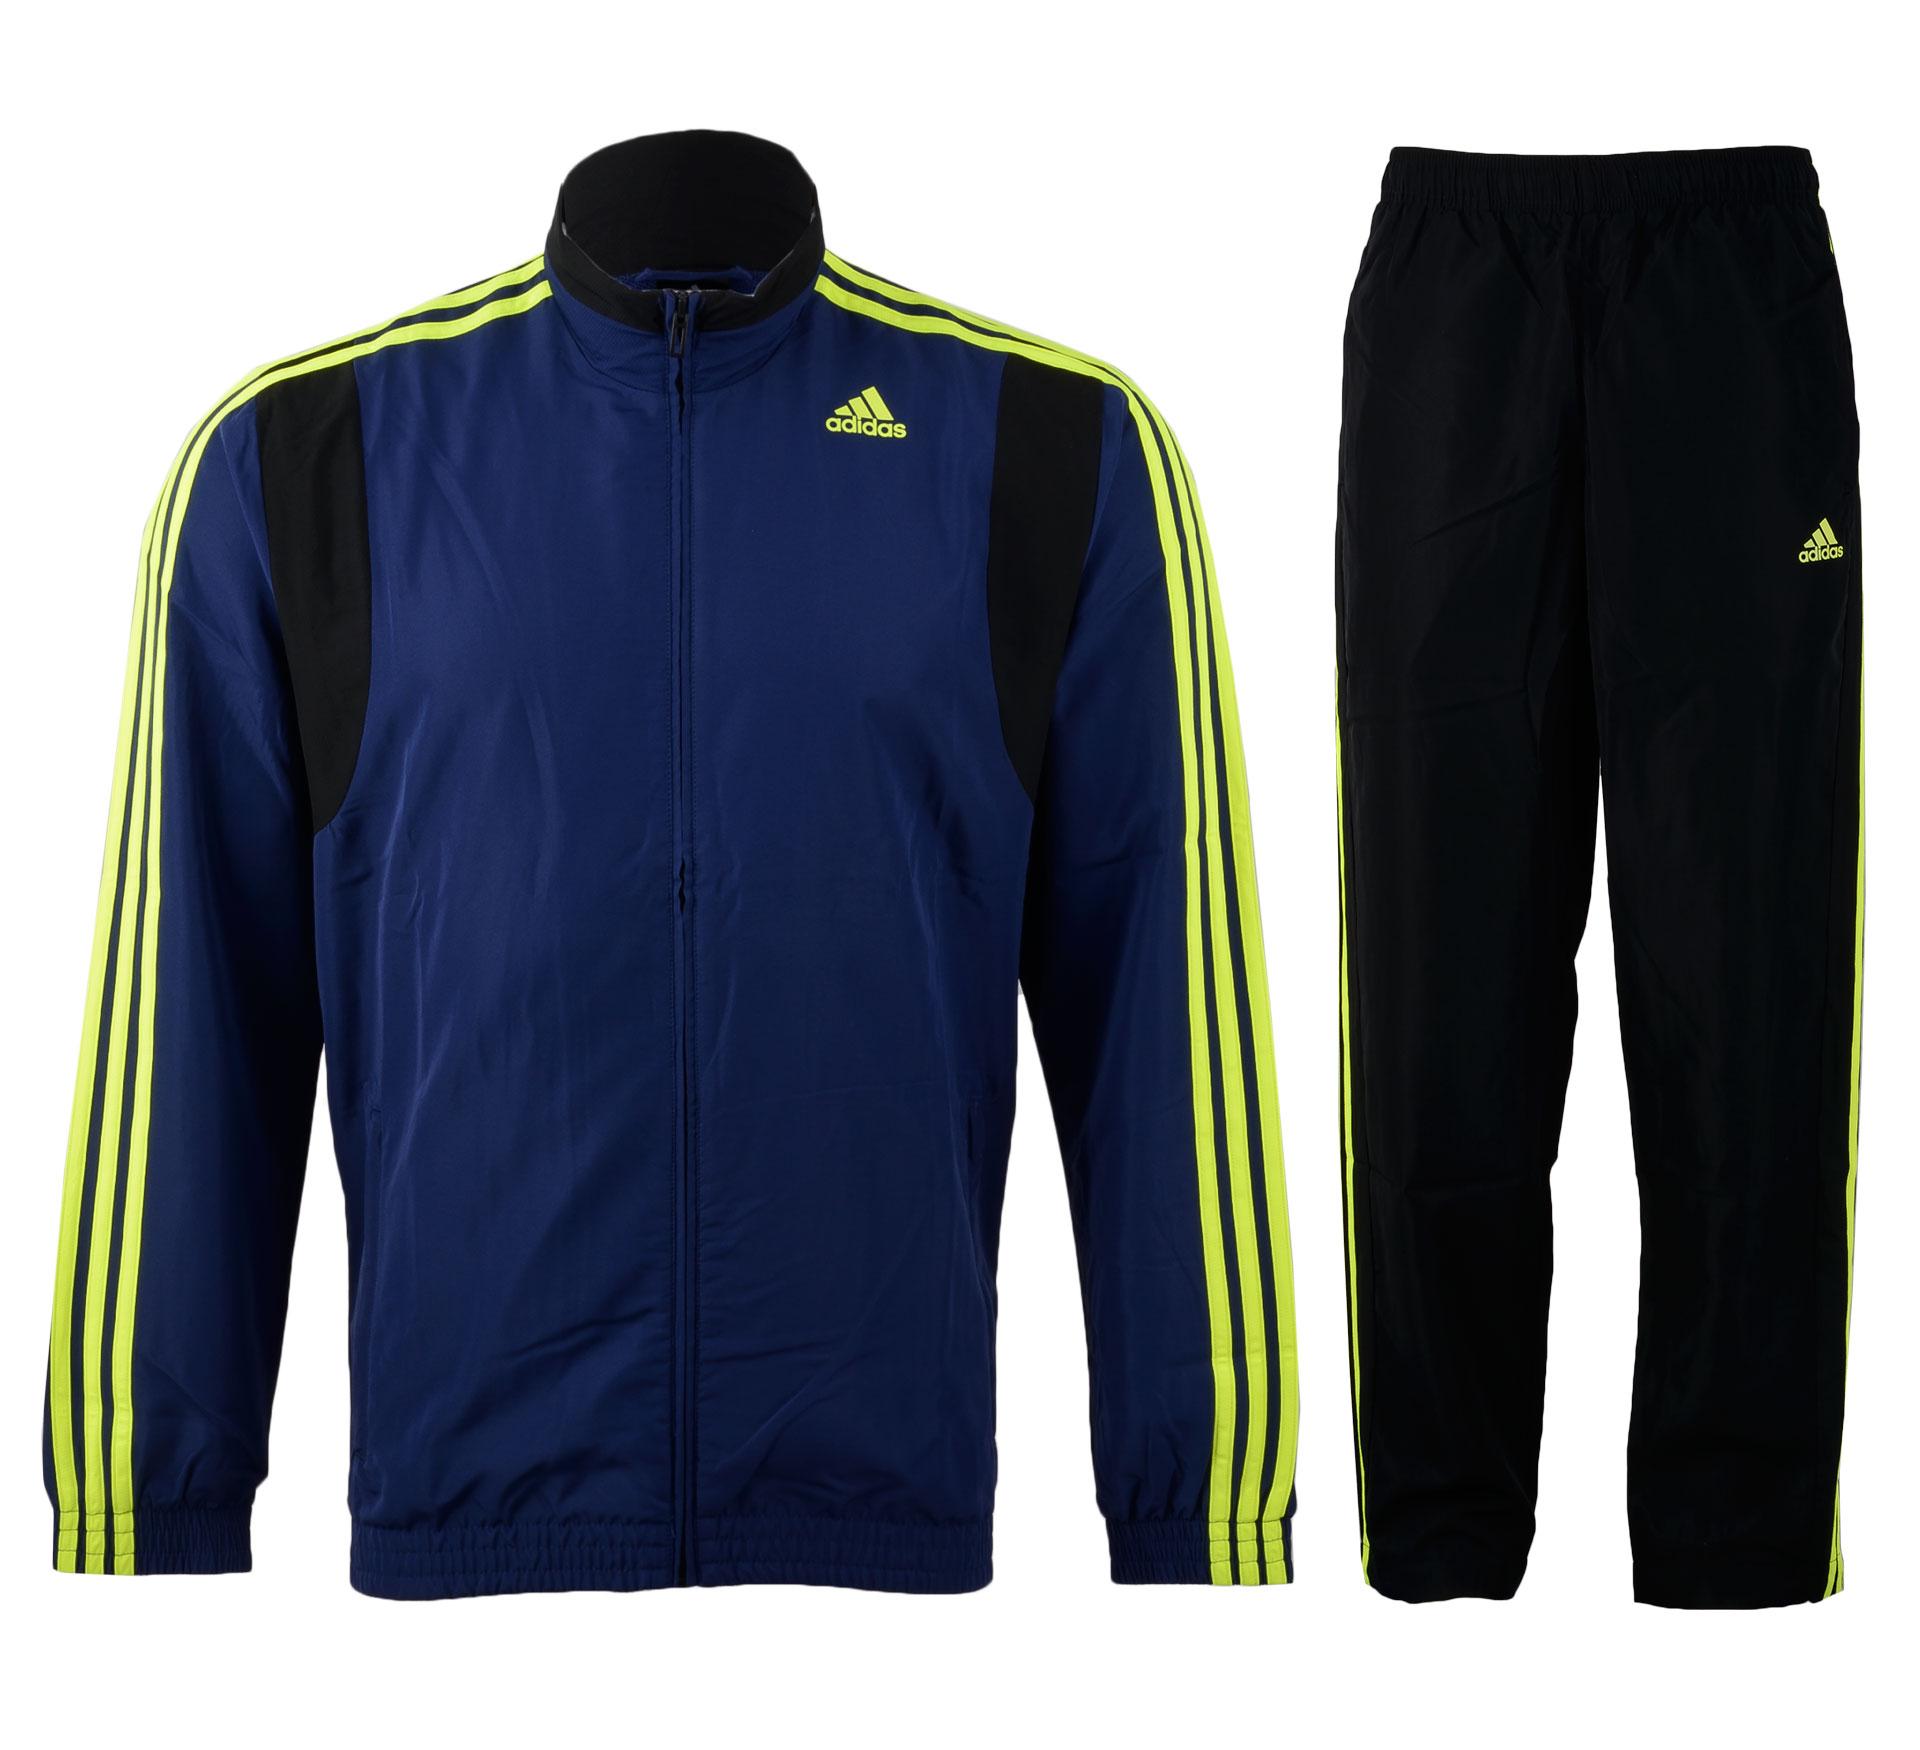 Adidas  TS Basic 3S navy - zwart - geel